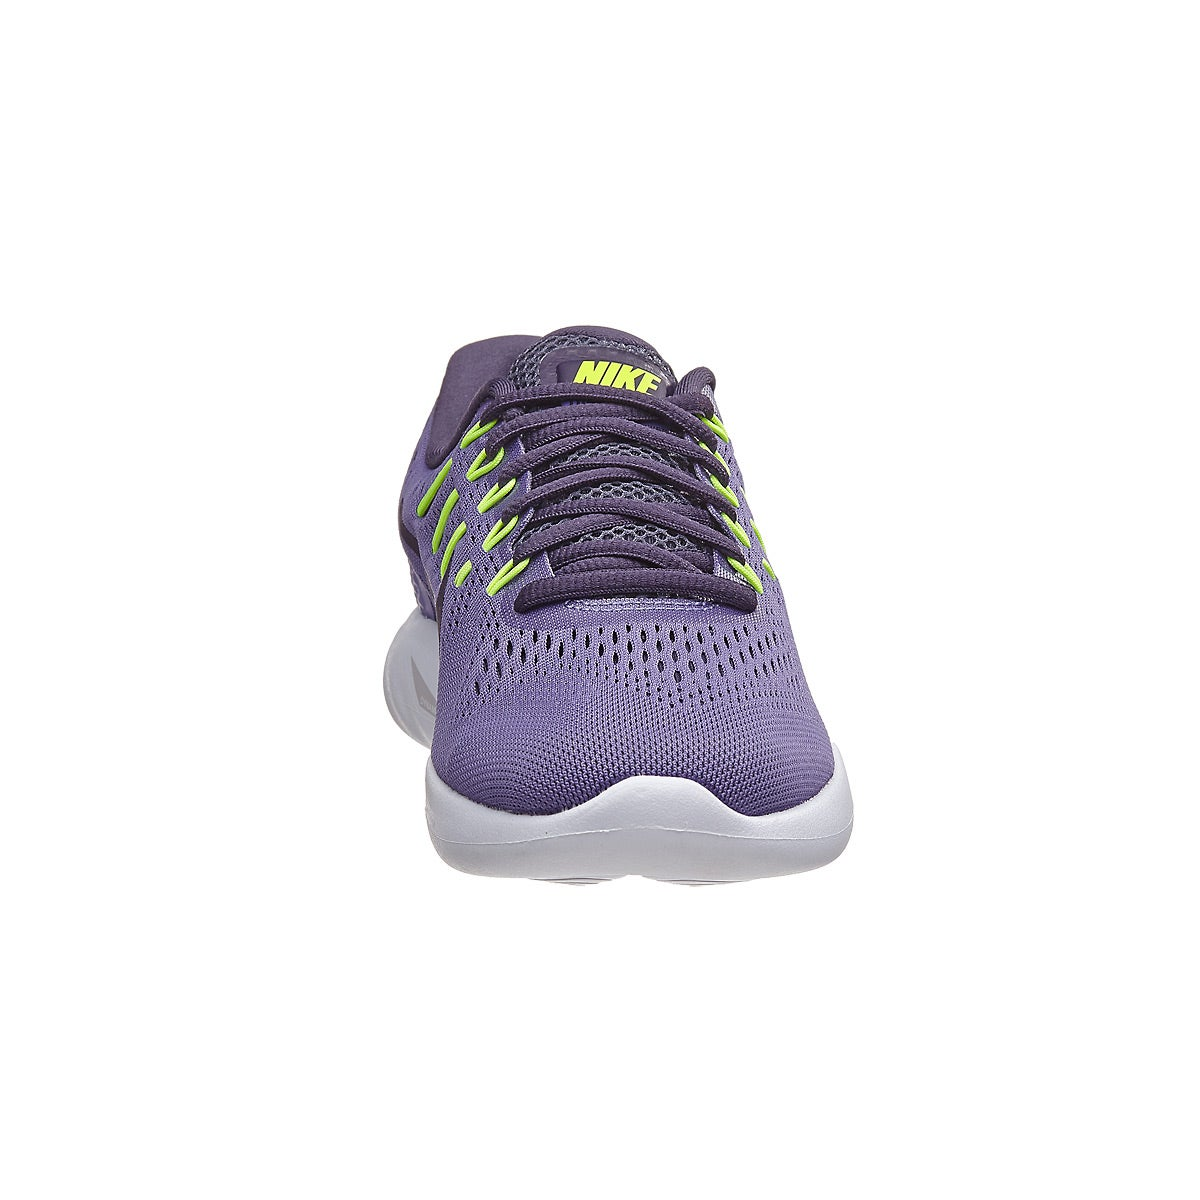 free shipping f9498 22f6e Nike LunarGlide 8 Womens Shoes PurpleDark Raisin 360° View Running  Warehouse.